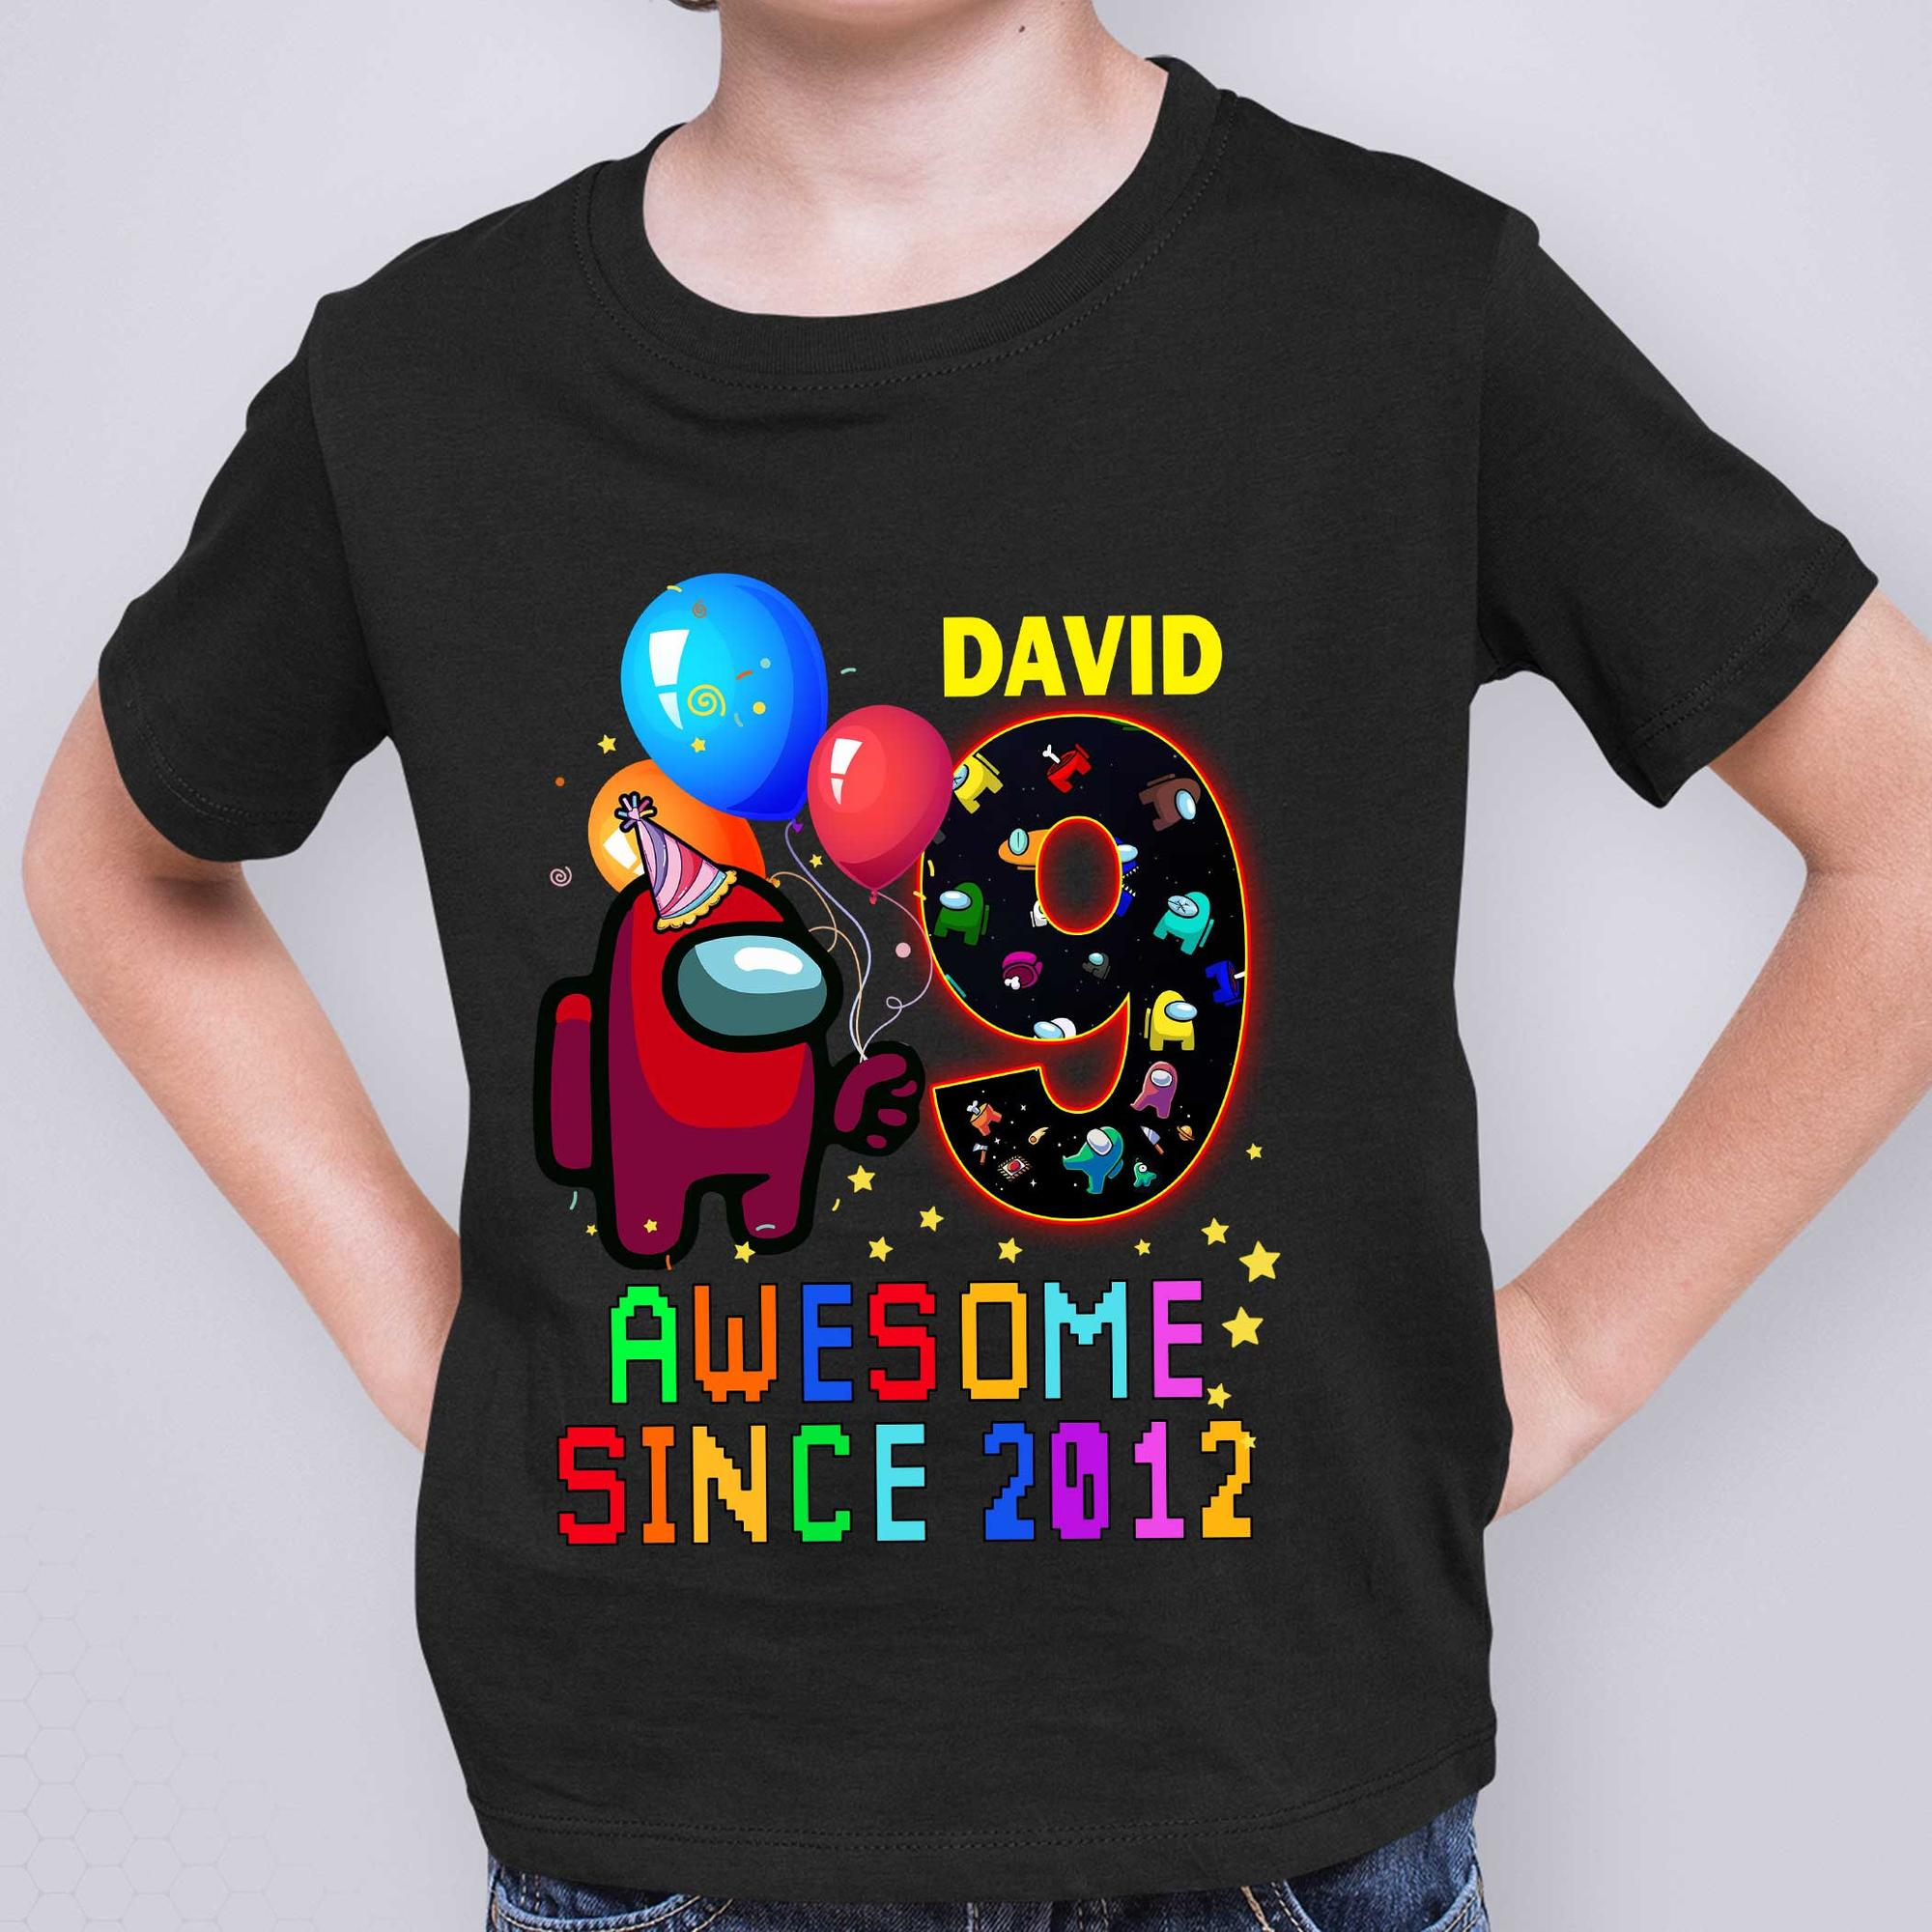 Personalized Among Us Birthday Gift Shirt 2